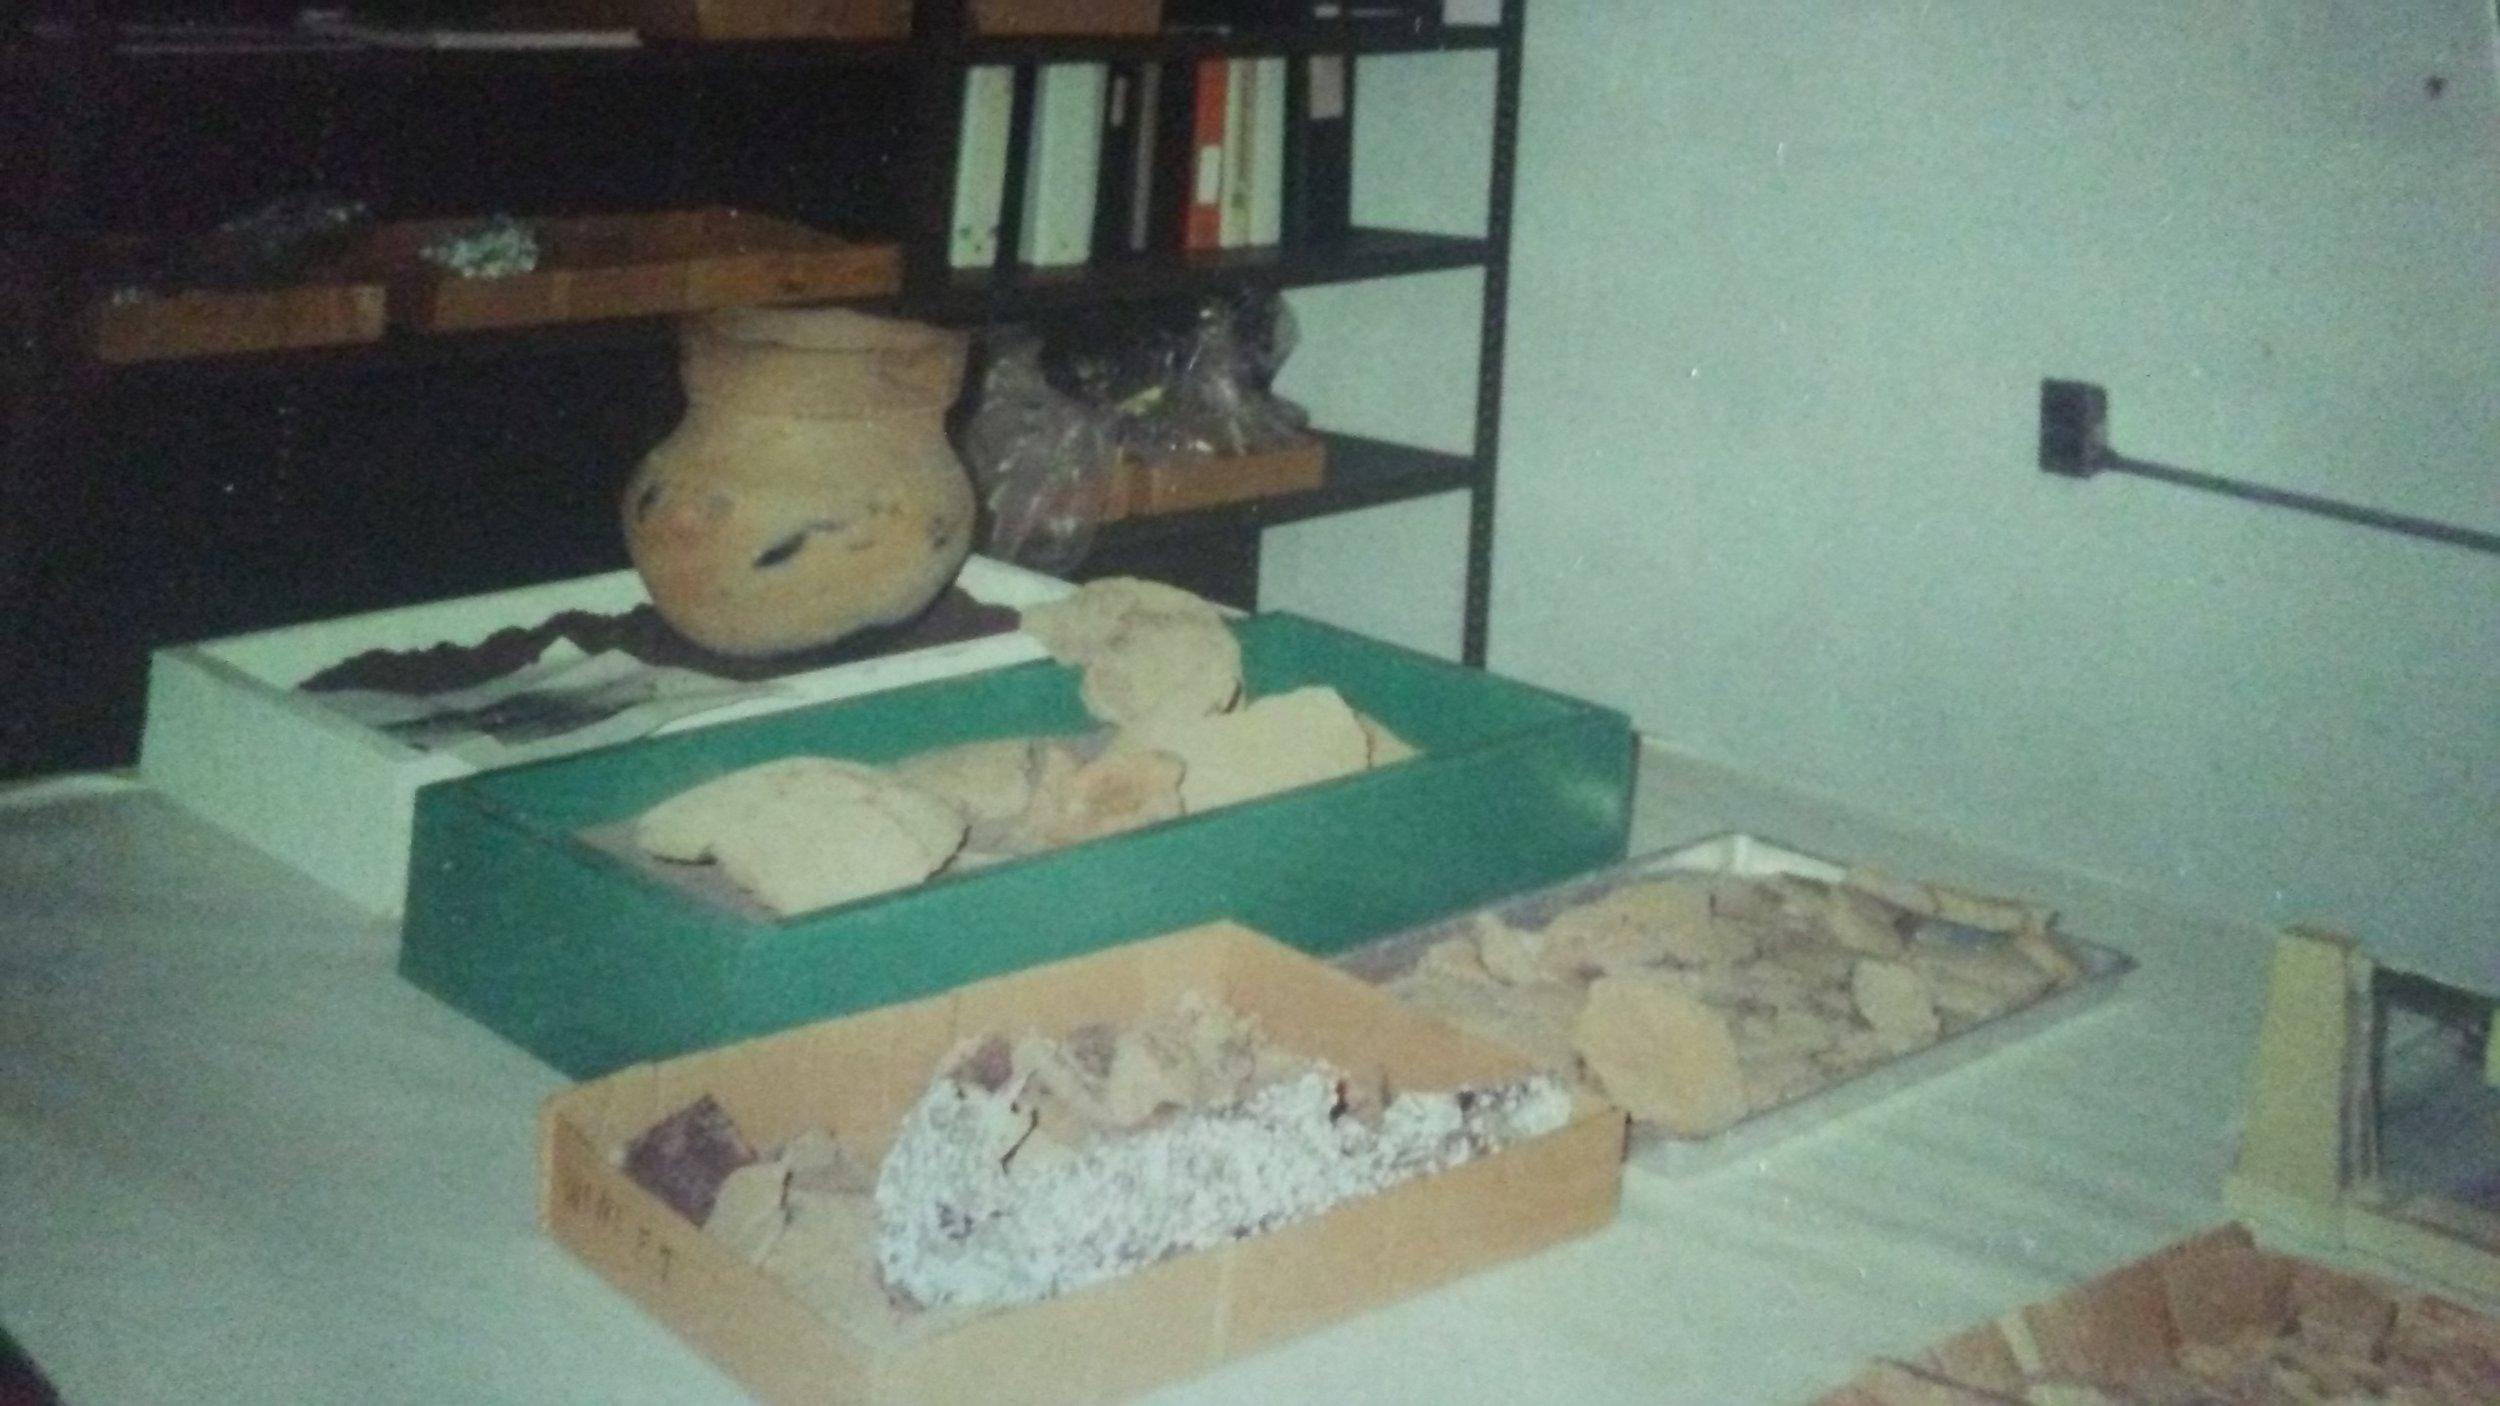 FARC Lab Settler's Day 1992